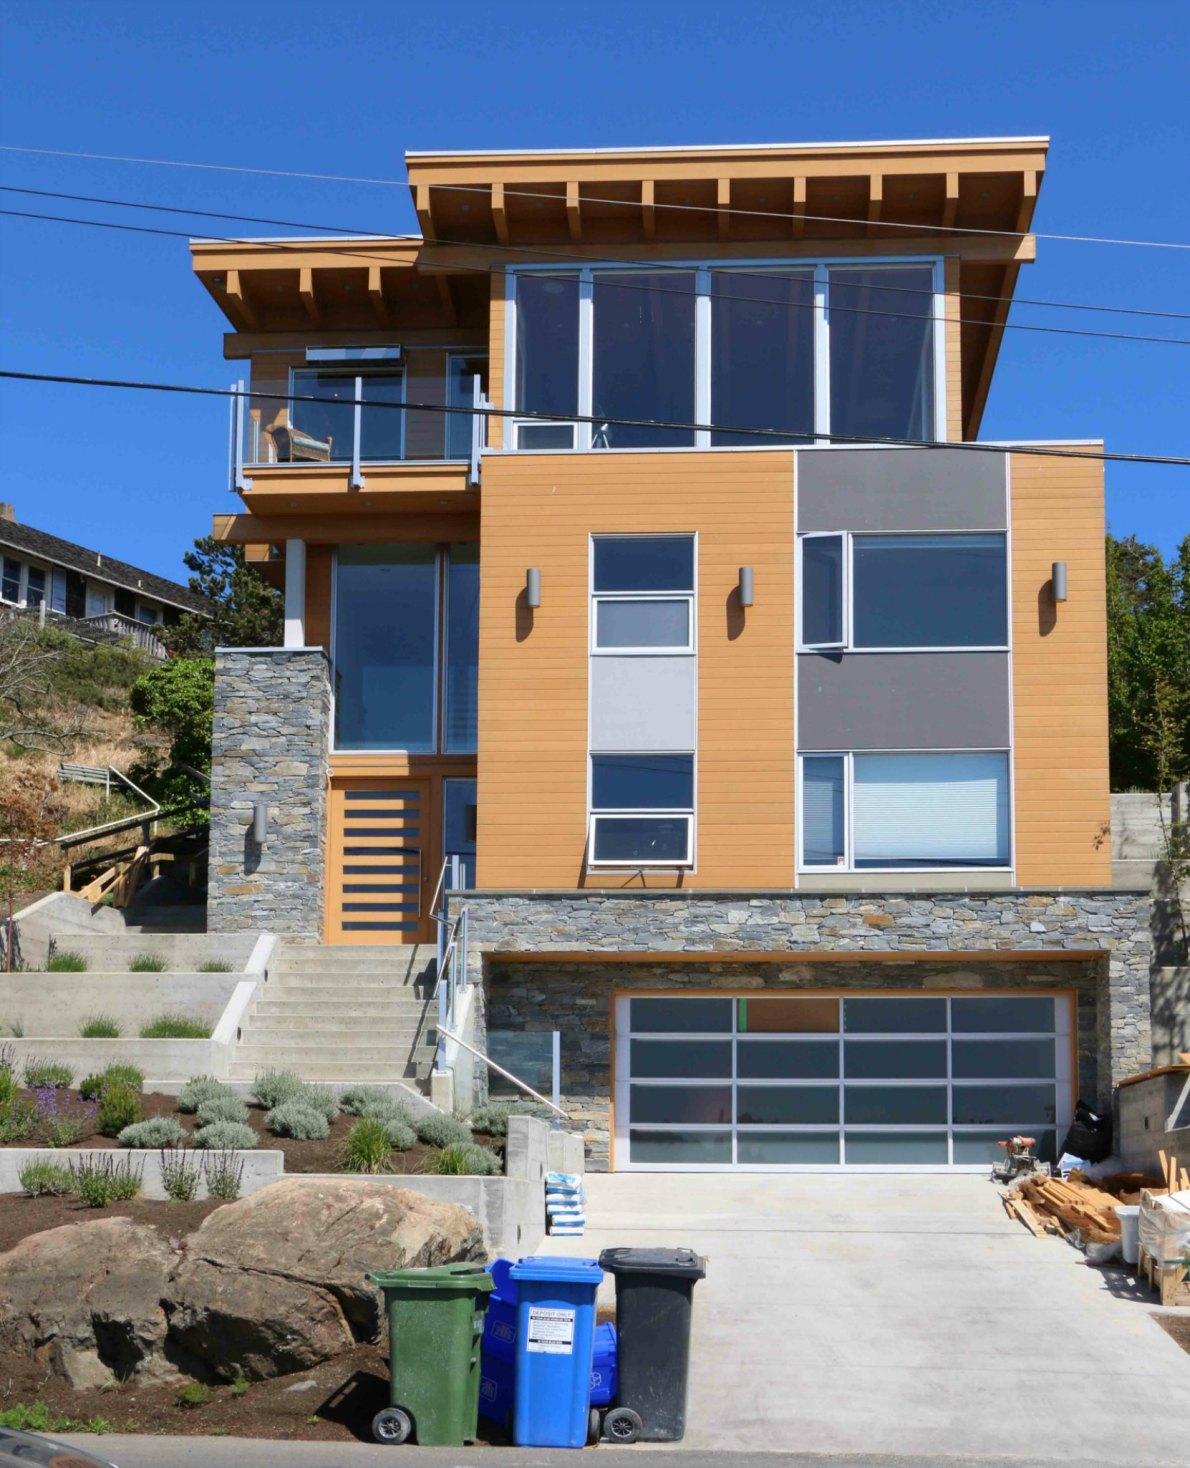 526 Beach Drive, Oak bay. Built in 2014.